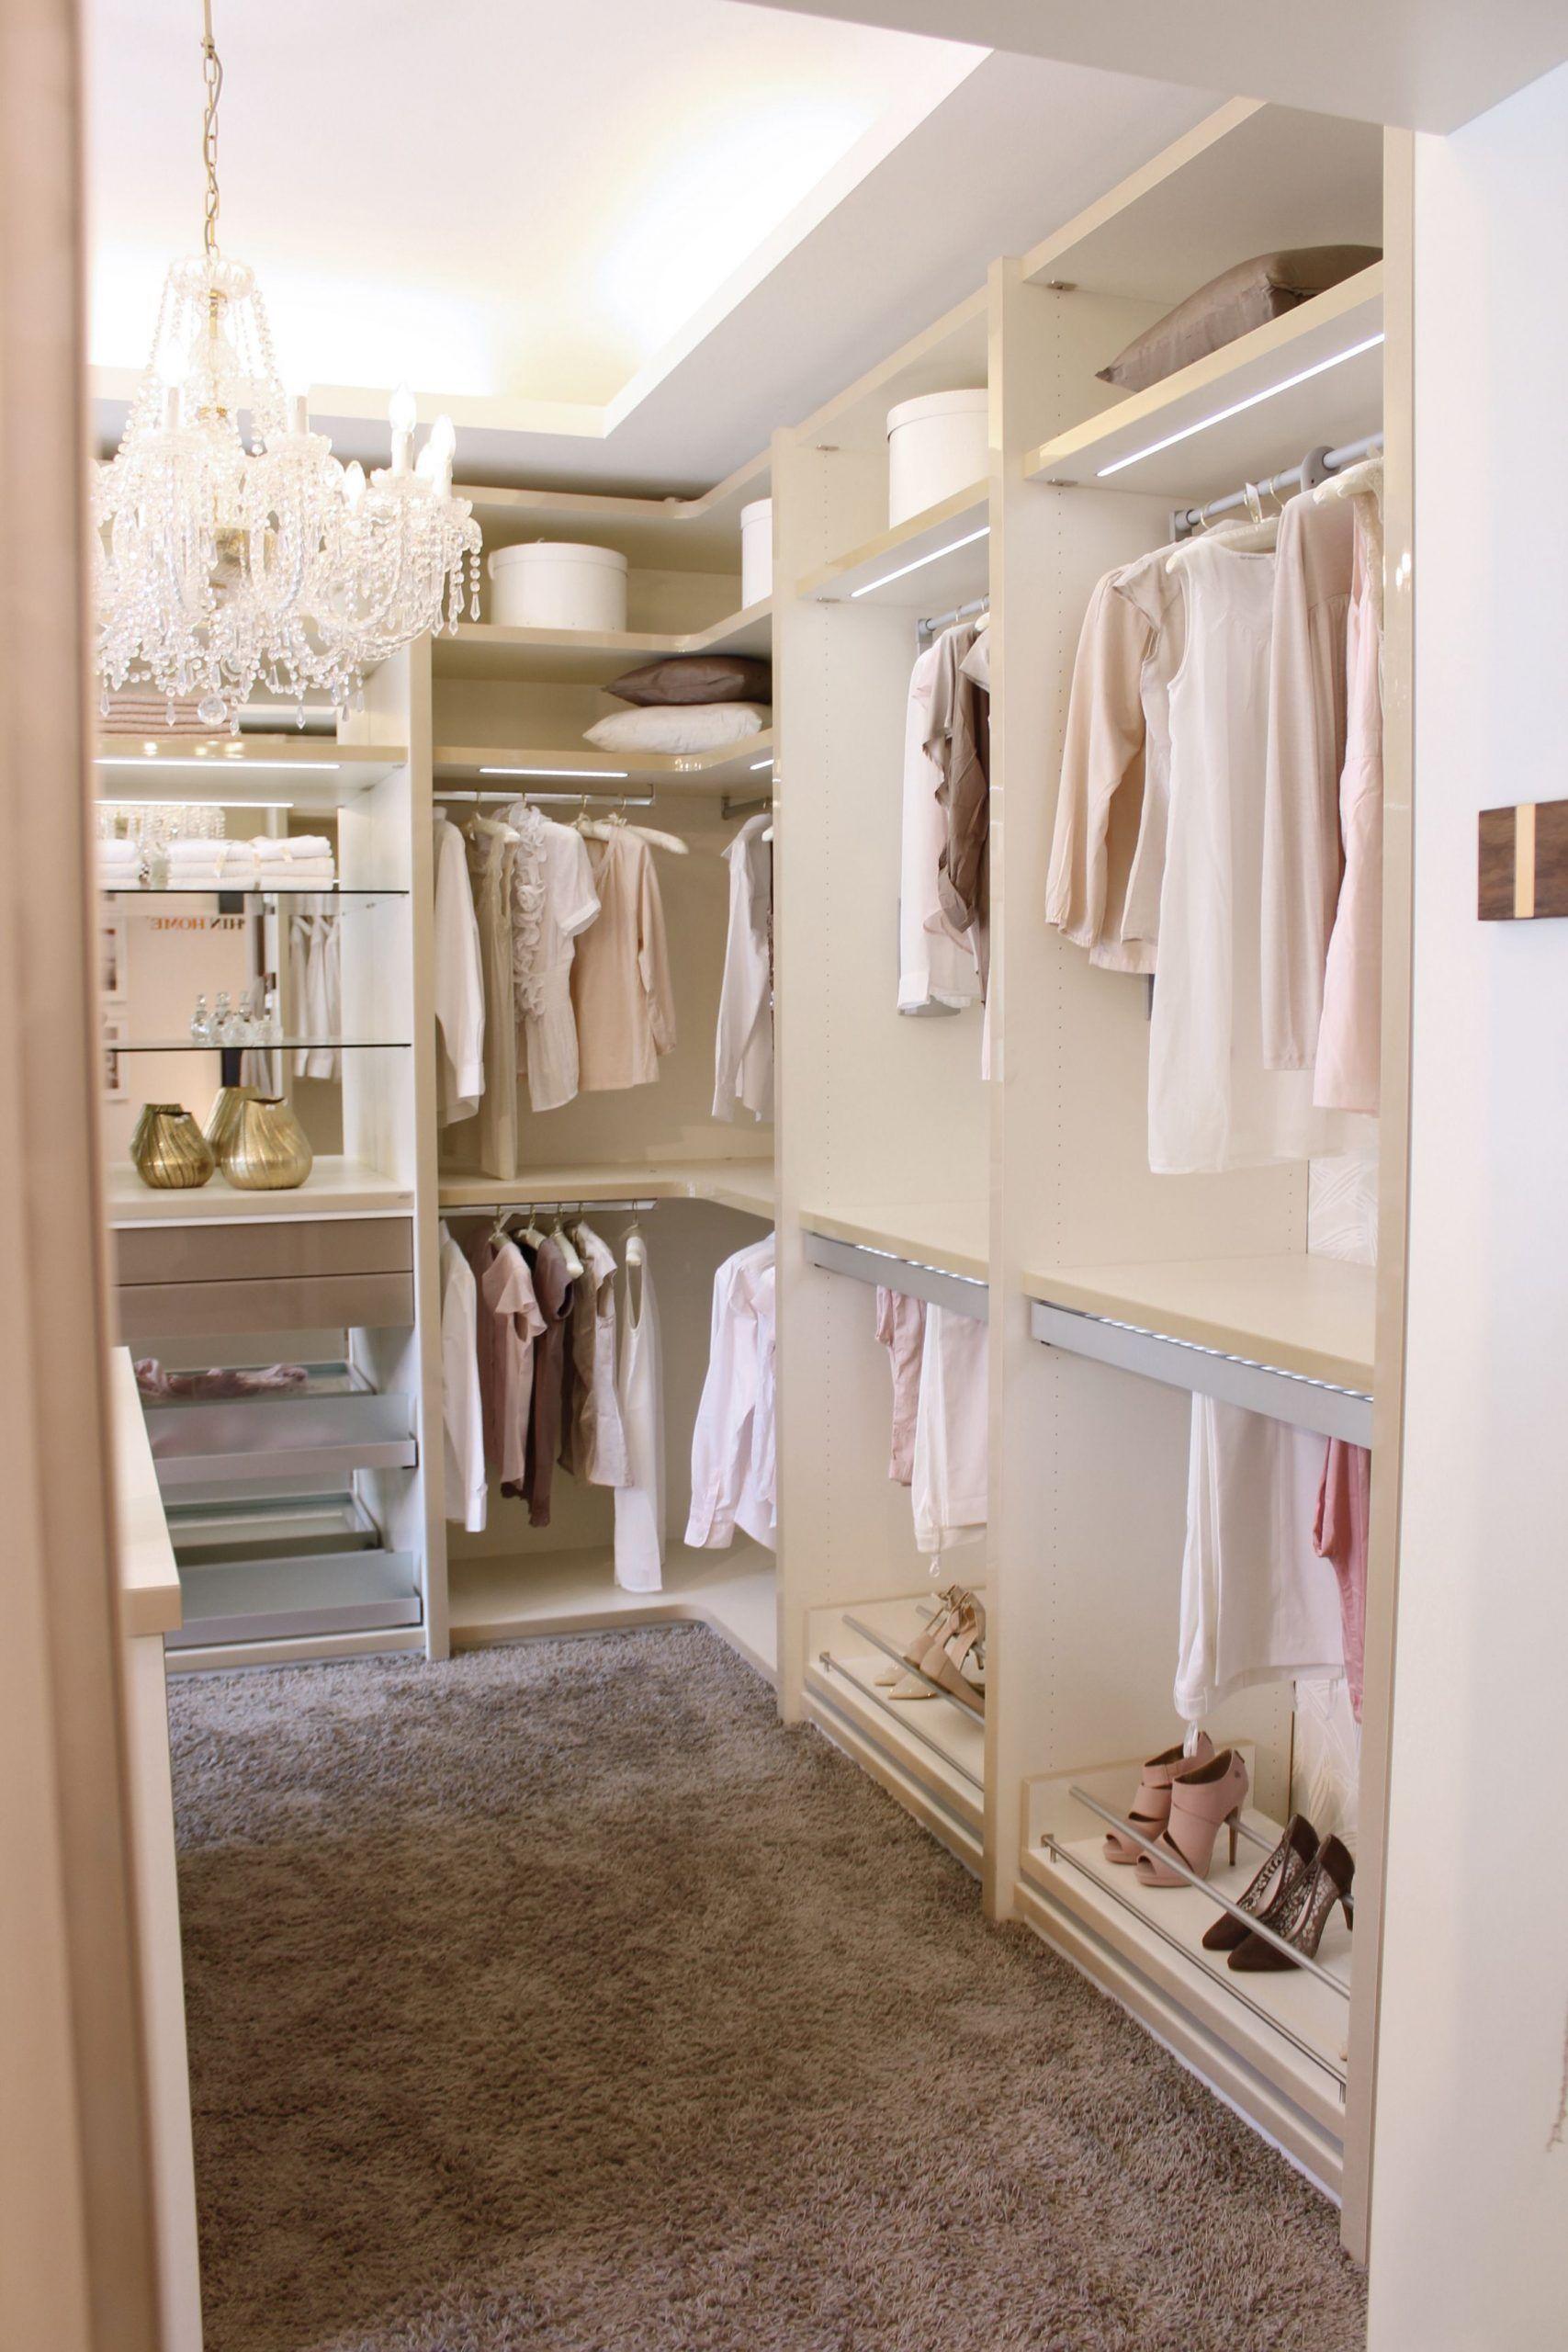 Built In Wardrobes Walk In Closets Builtin Closets Walkin